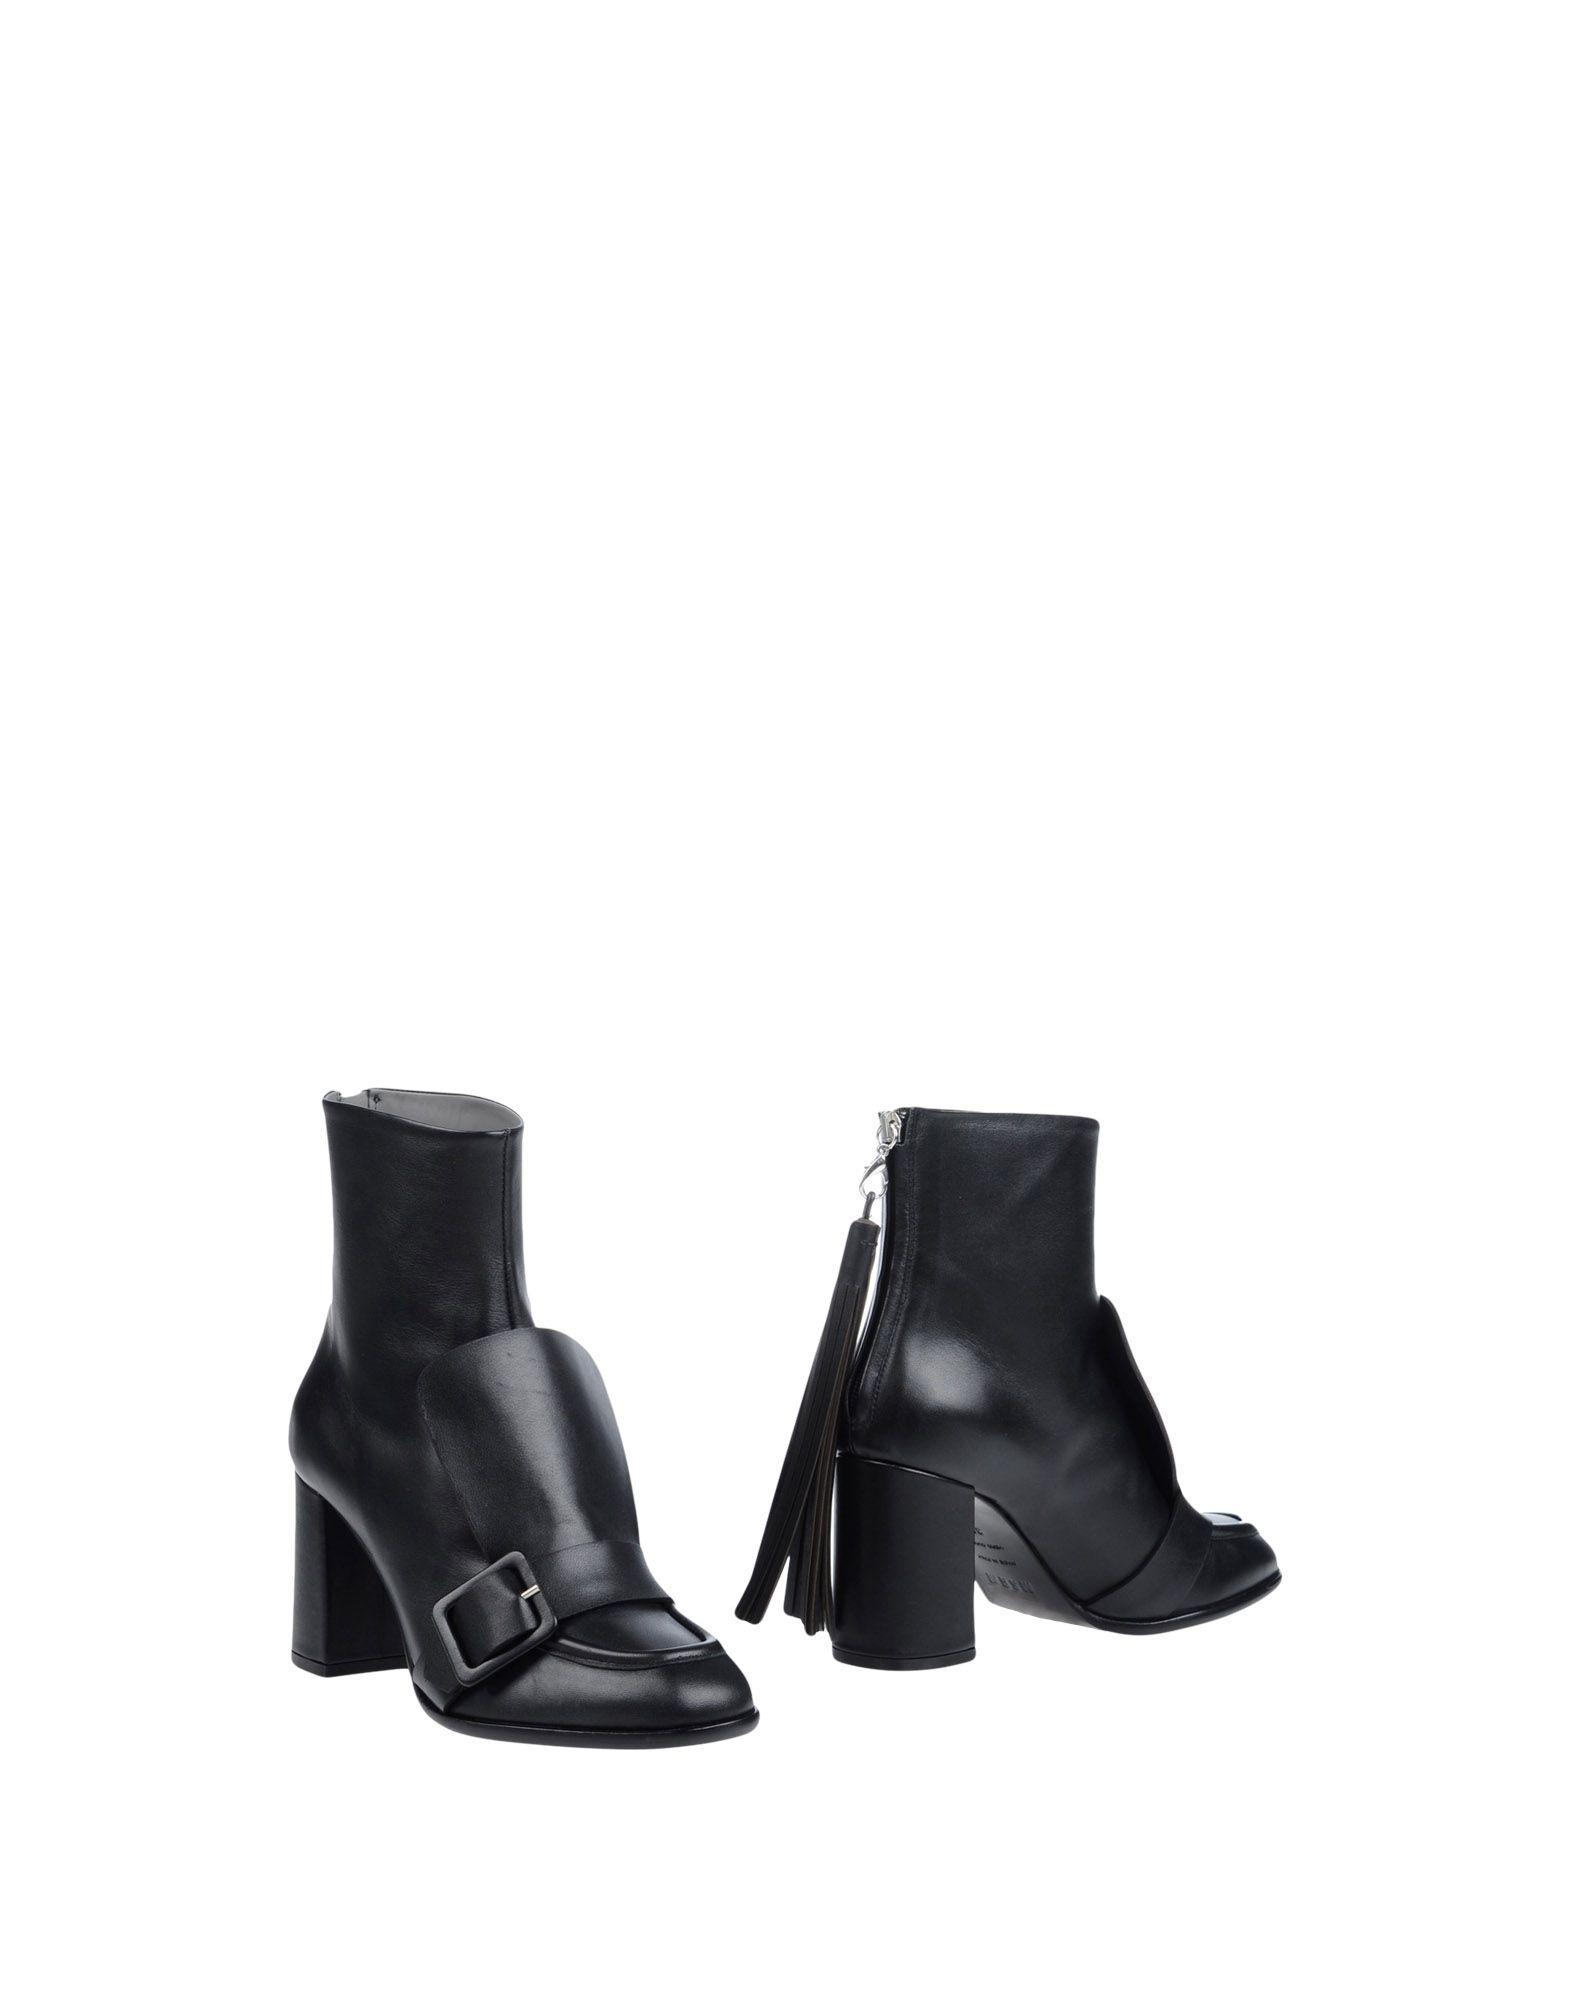 Msgm Stiefelette Damen Heiße  11263856JE Heiße Damen Schuhe ea62fb